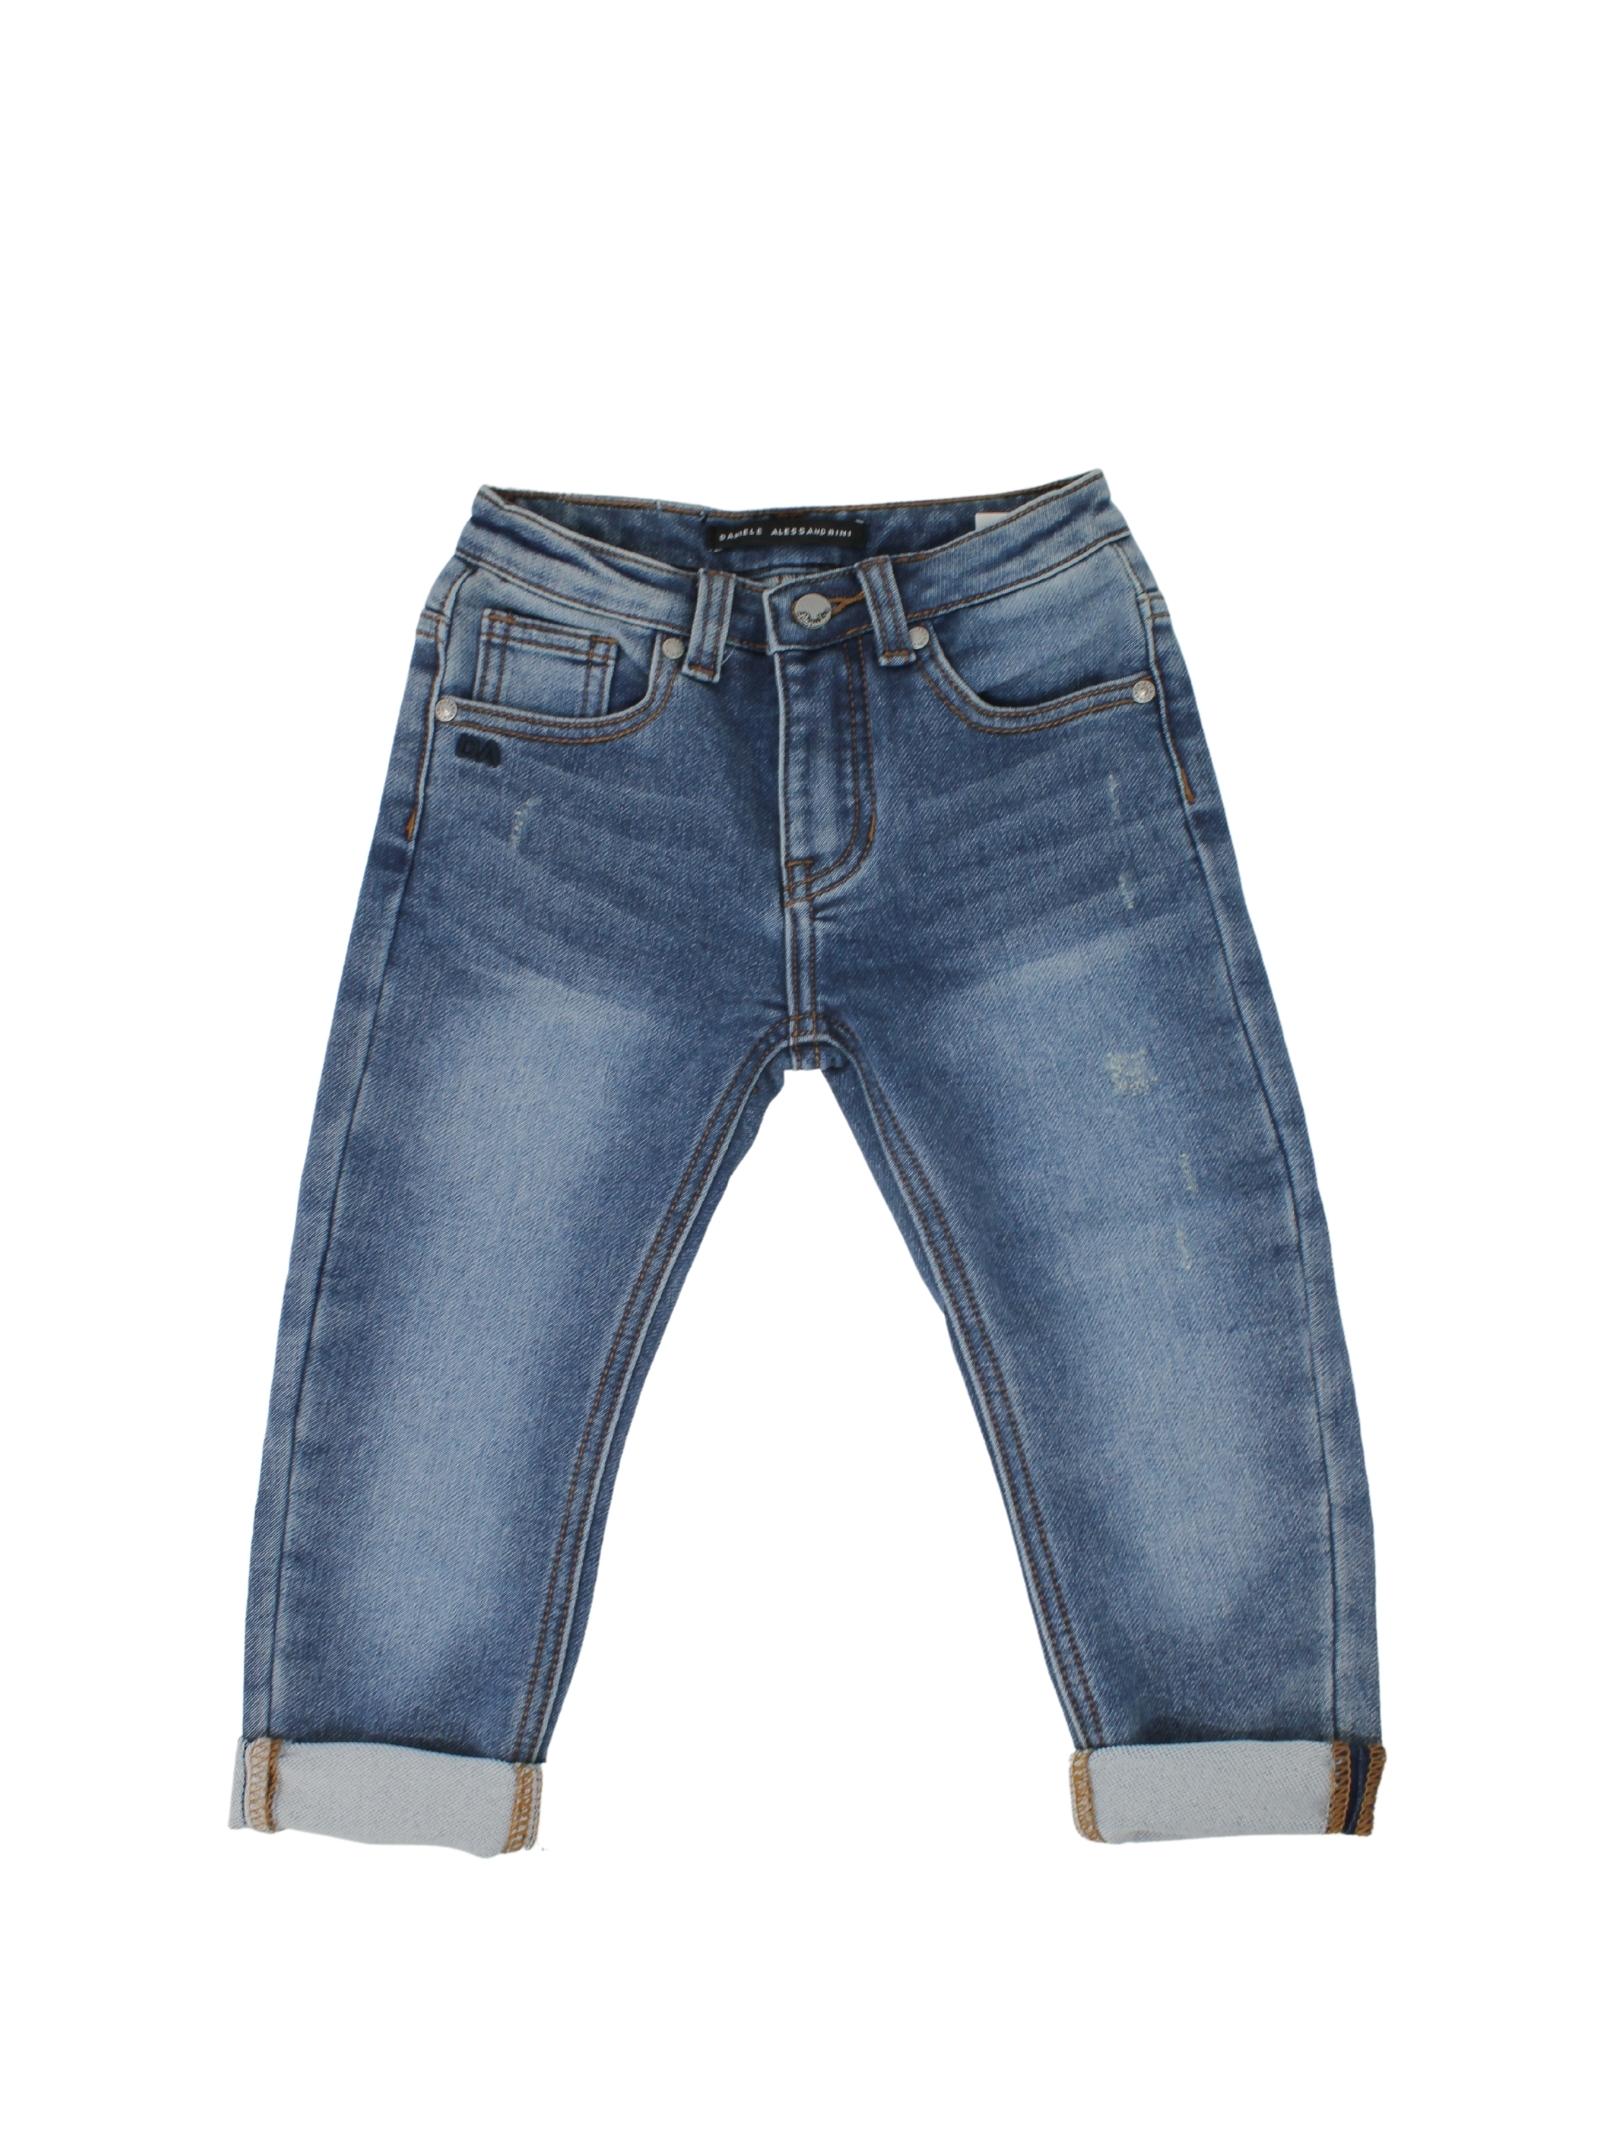 Basic Jeans for Boys DANIELE ALESSANDRINI JUNIOR | Trousers | 1291D0757BLU